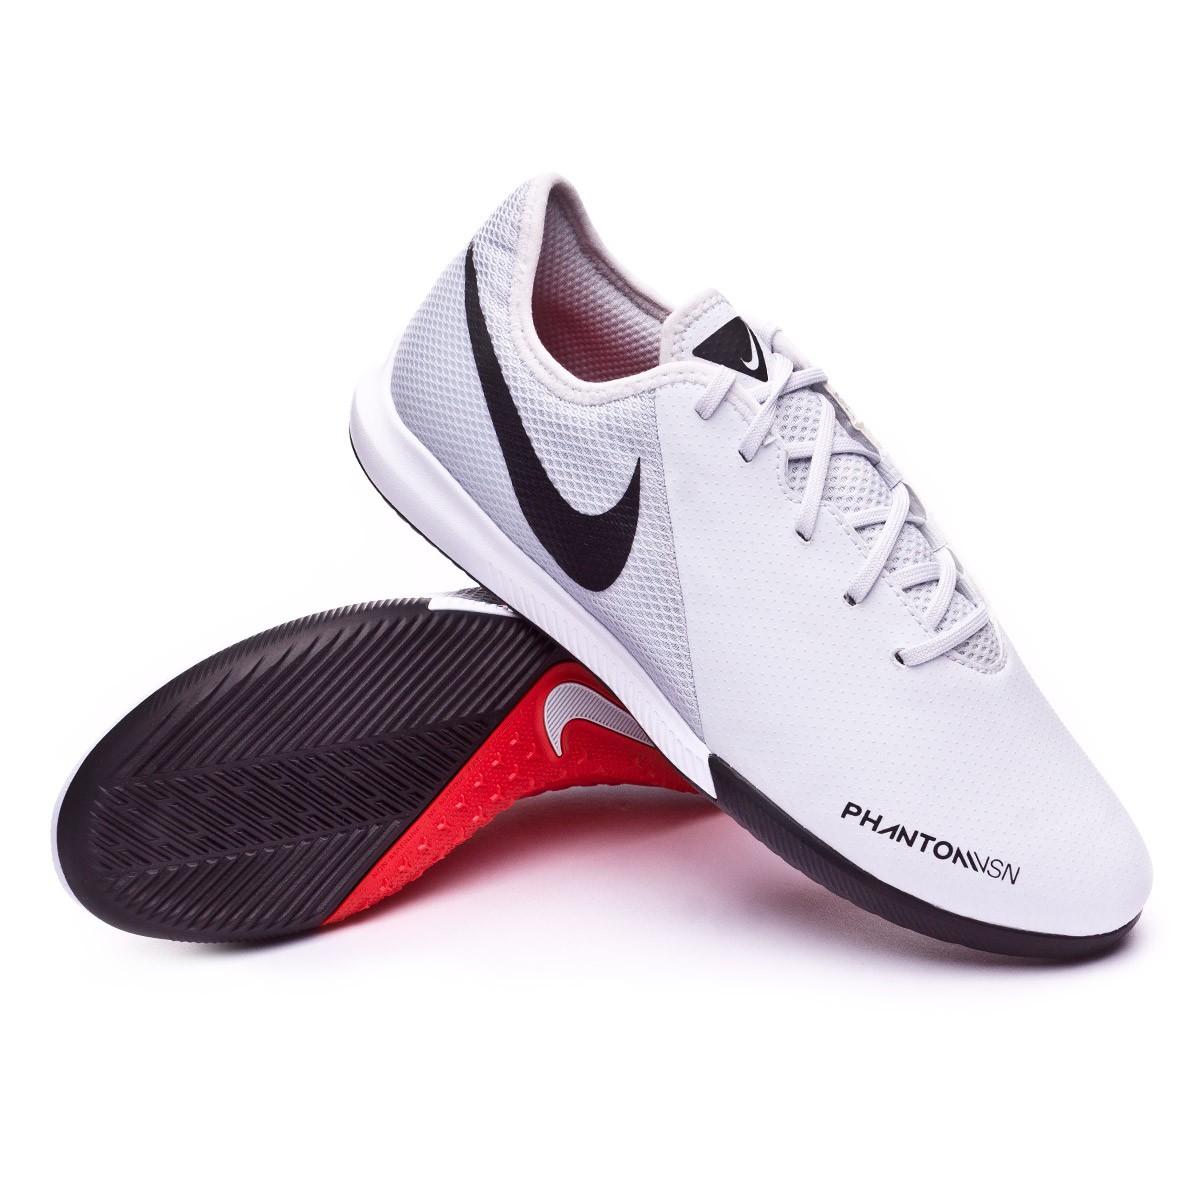 5a5e99fb23690 Futsal Boot Nike Phantom Vision Academy IC Pure platinum-Light  crimson-White - Football store Fútbol Emotion